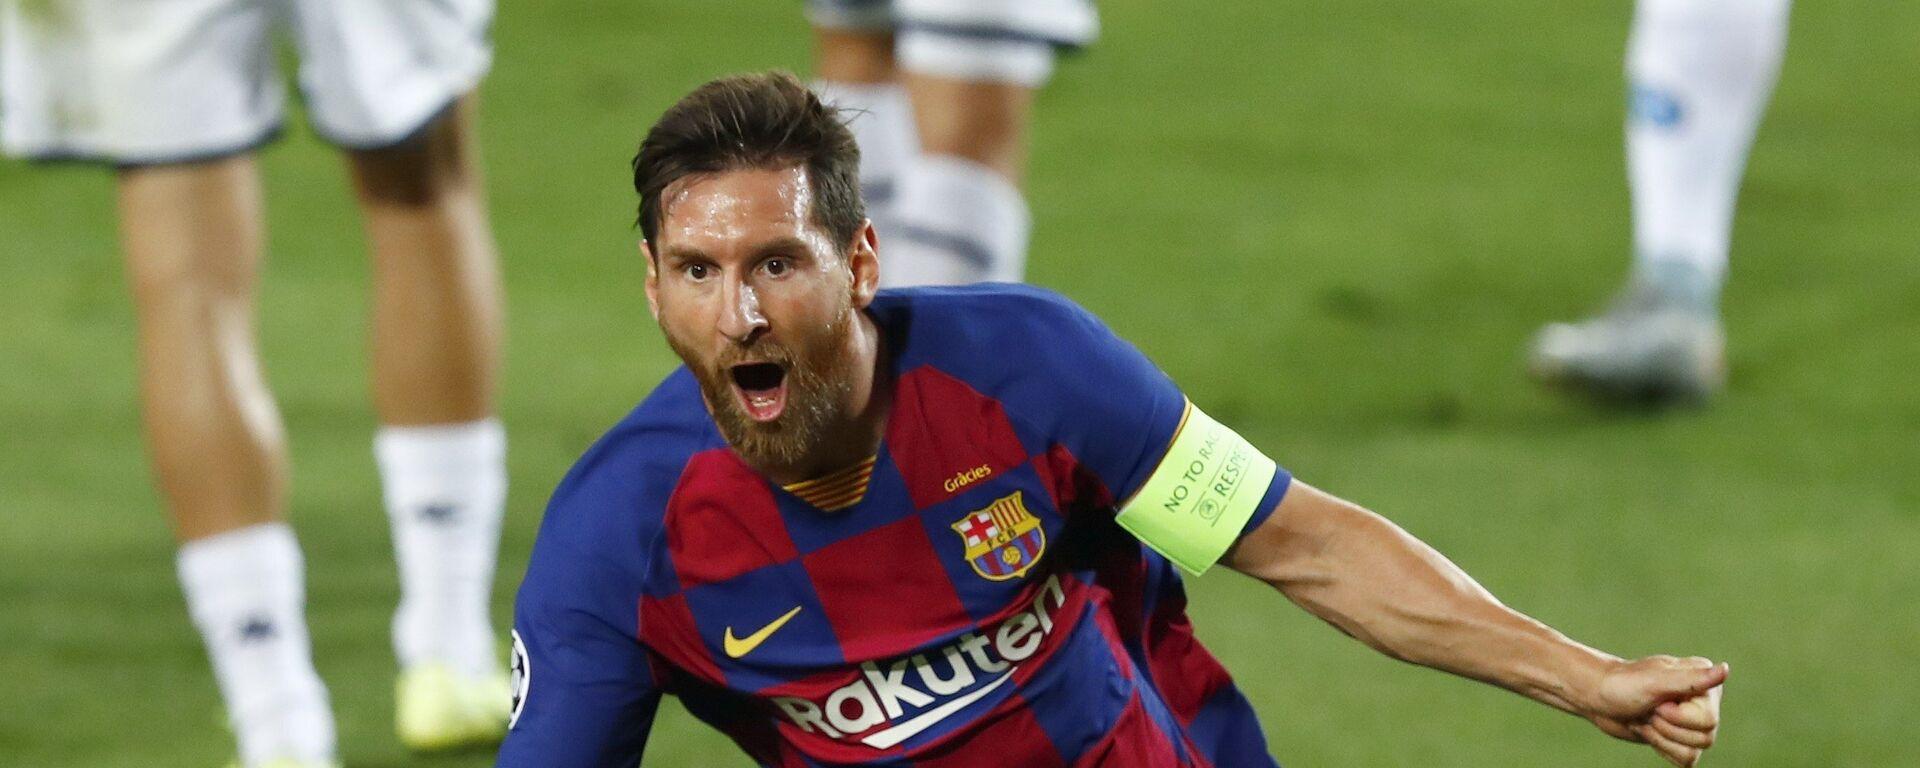 Leo Messi, futbolista argentino - Sputnik Mundo, 1920, 09.02.2021